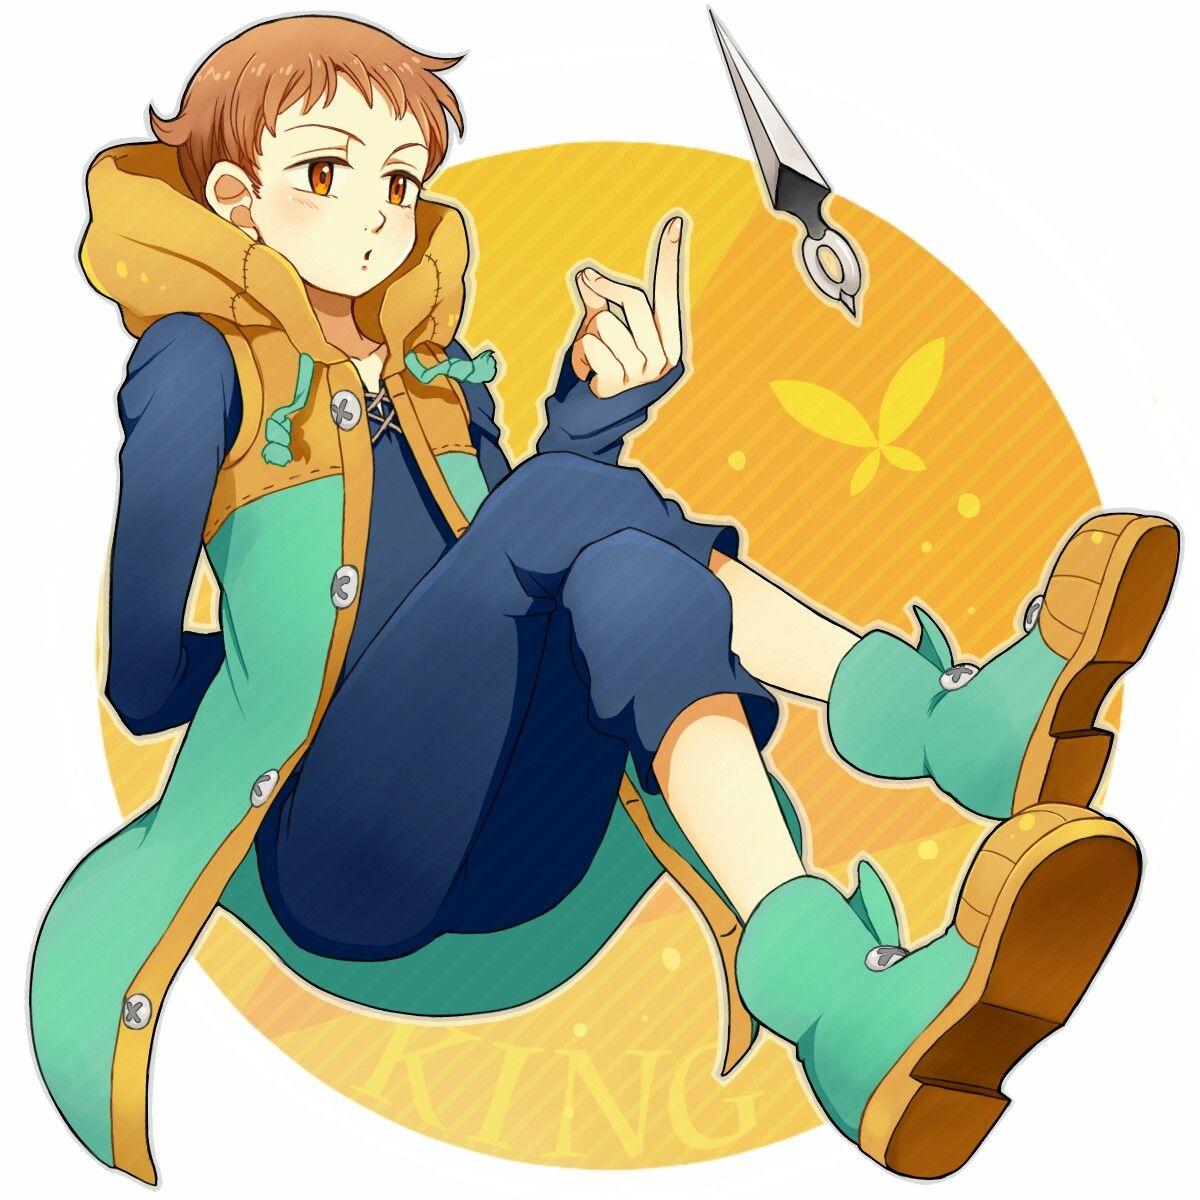 Pin by 『Darkness Fox 』 on King Pinterest Anime, Manga